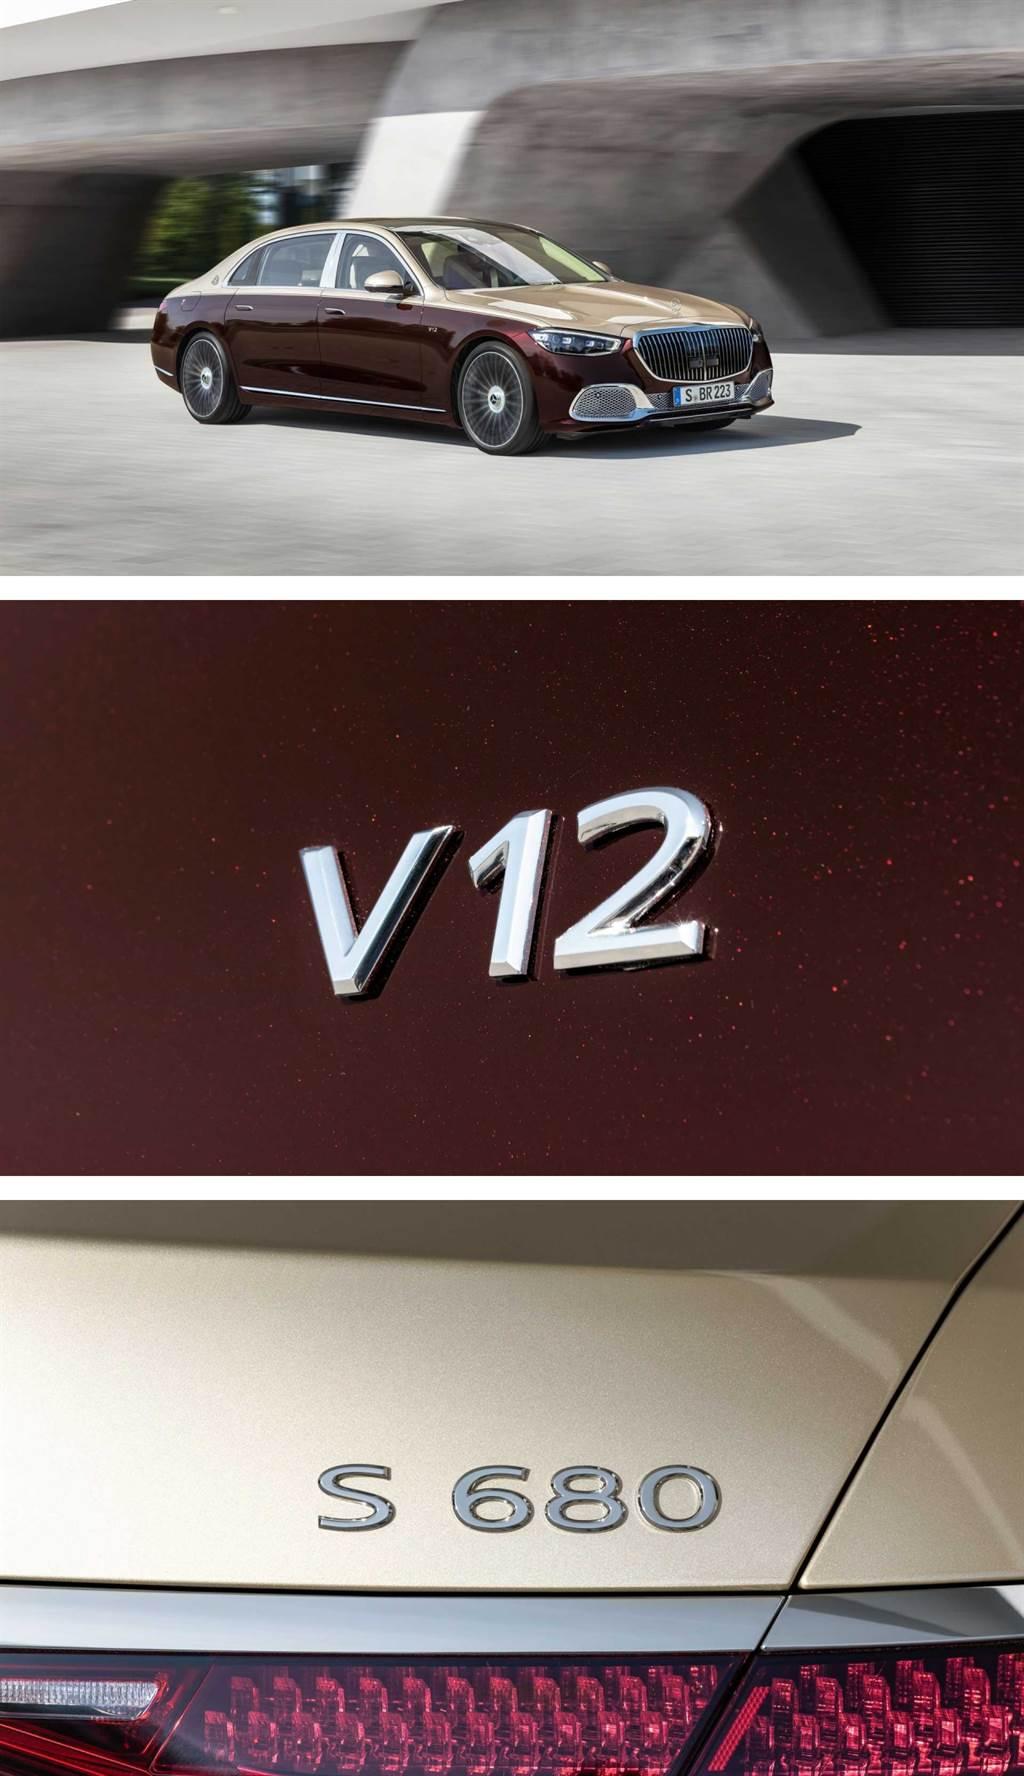 V12 王者駕臨、首度採用 4MATIC 技術,Mercedes-Maybach S680 悄悄亮相!